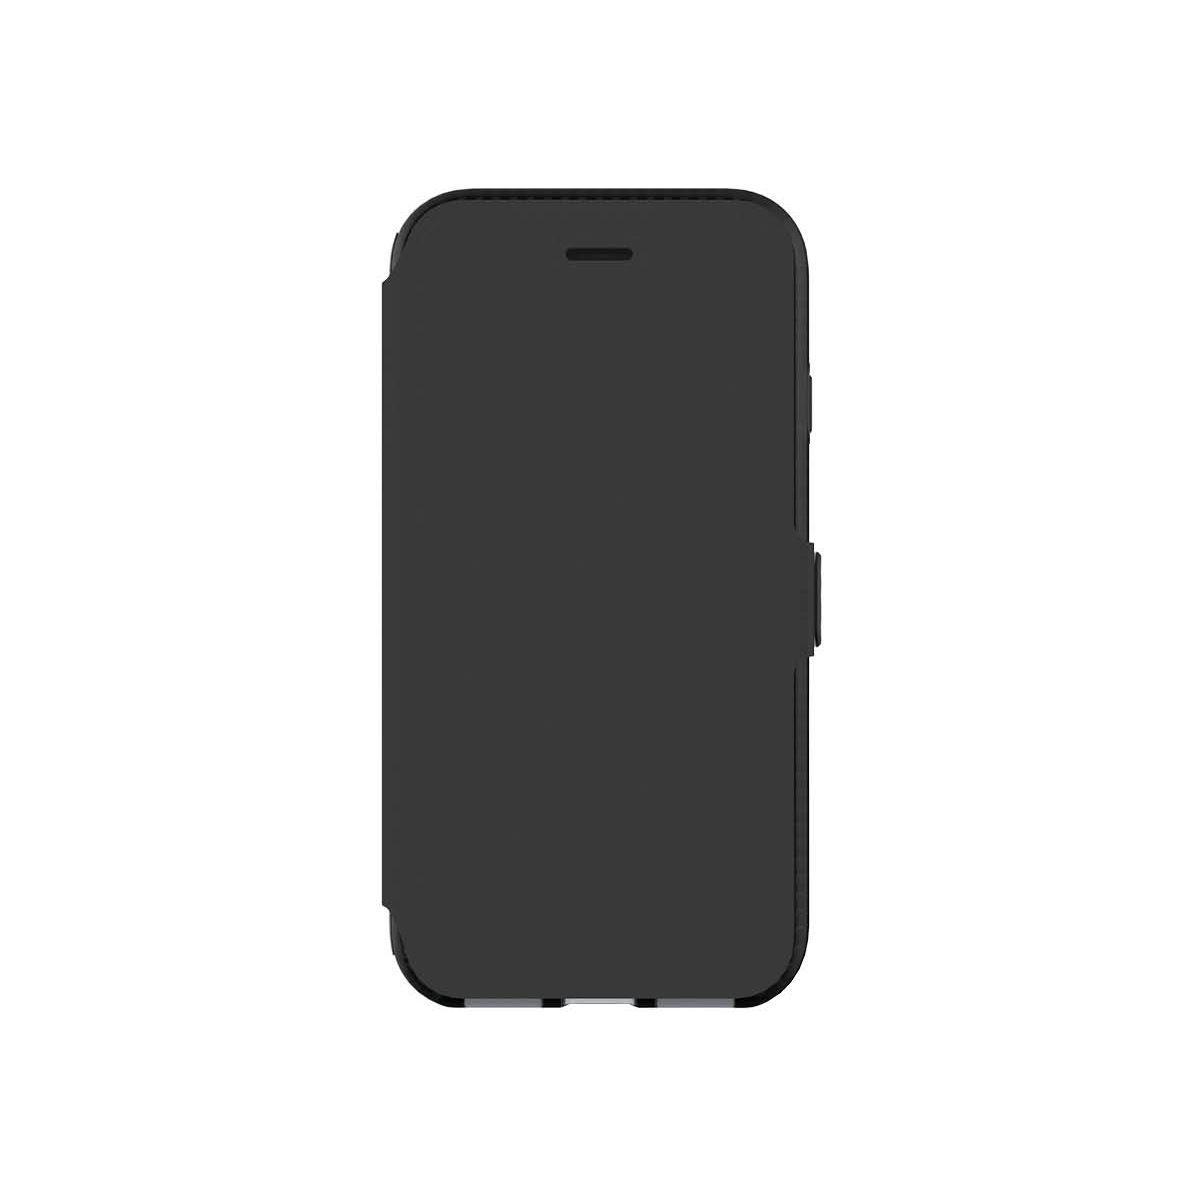 Etui tech 21 iphone 7 evo wallet noir - 20% de remise immédiate avec le code : multi20